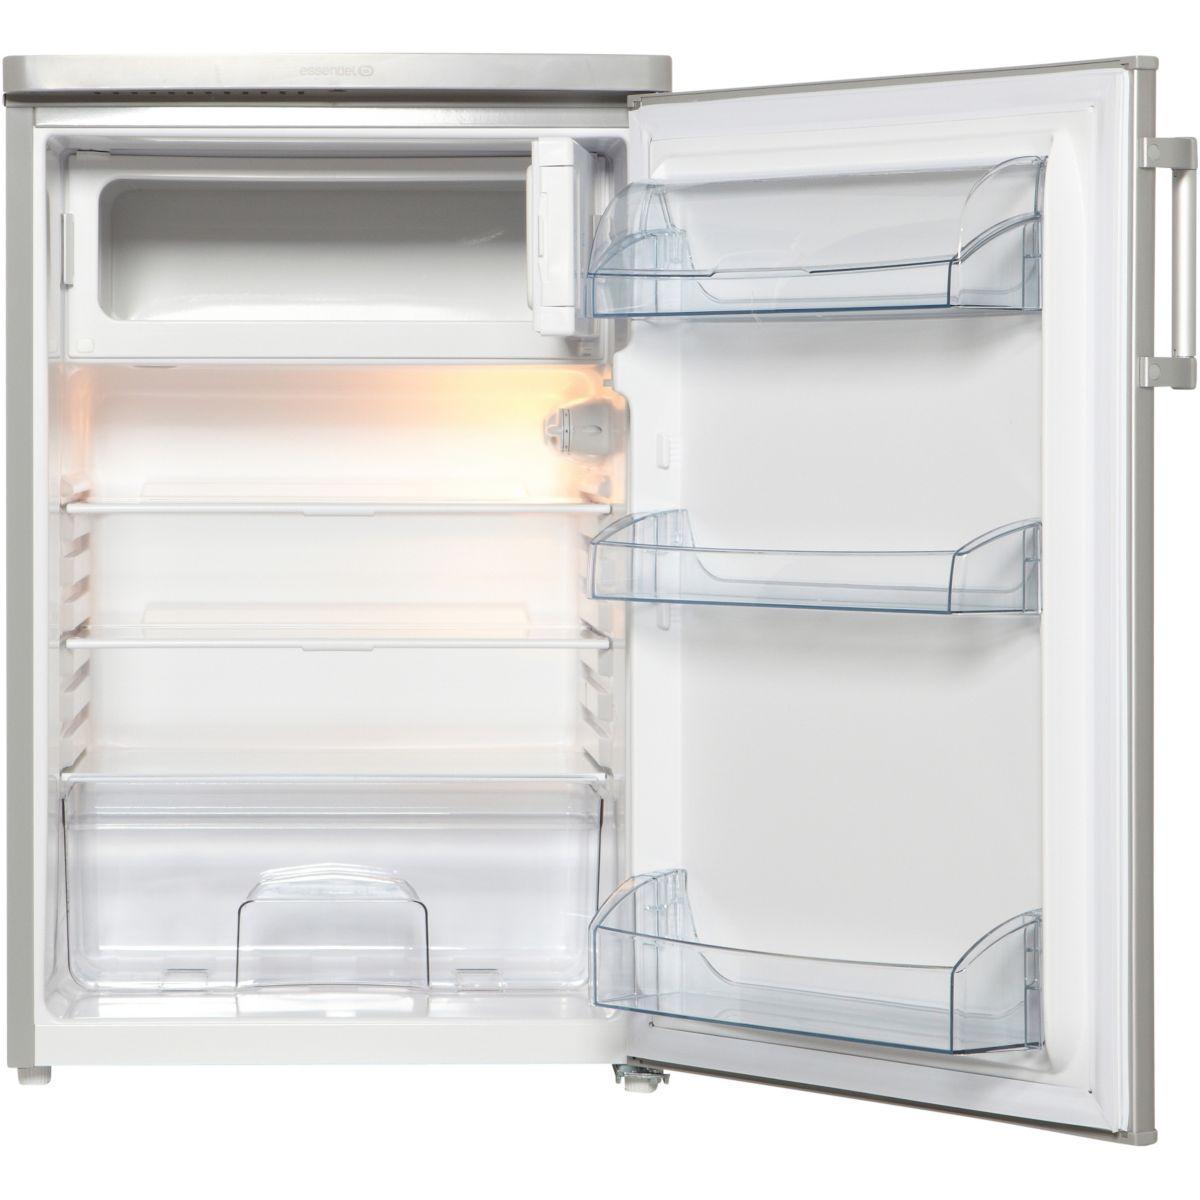 Réfrigérateur top ESSENTIEL B ERT 85-55s1